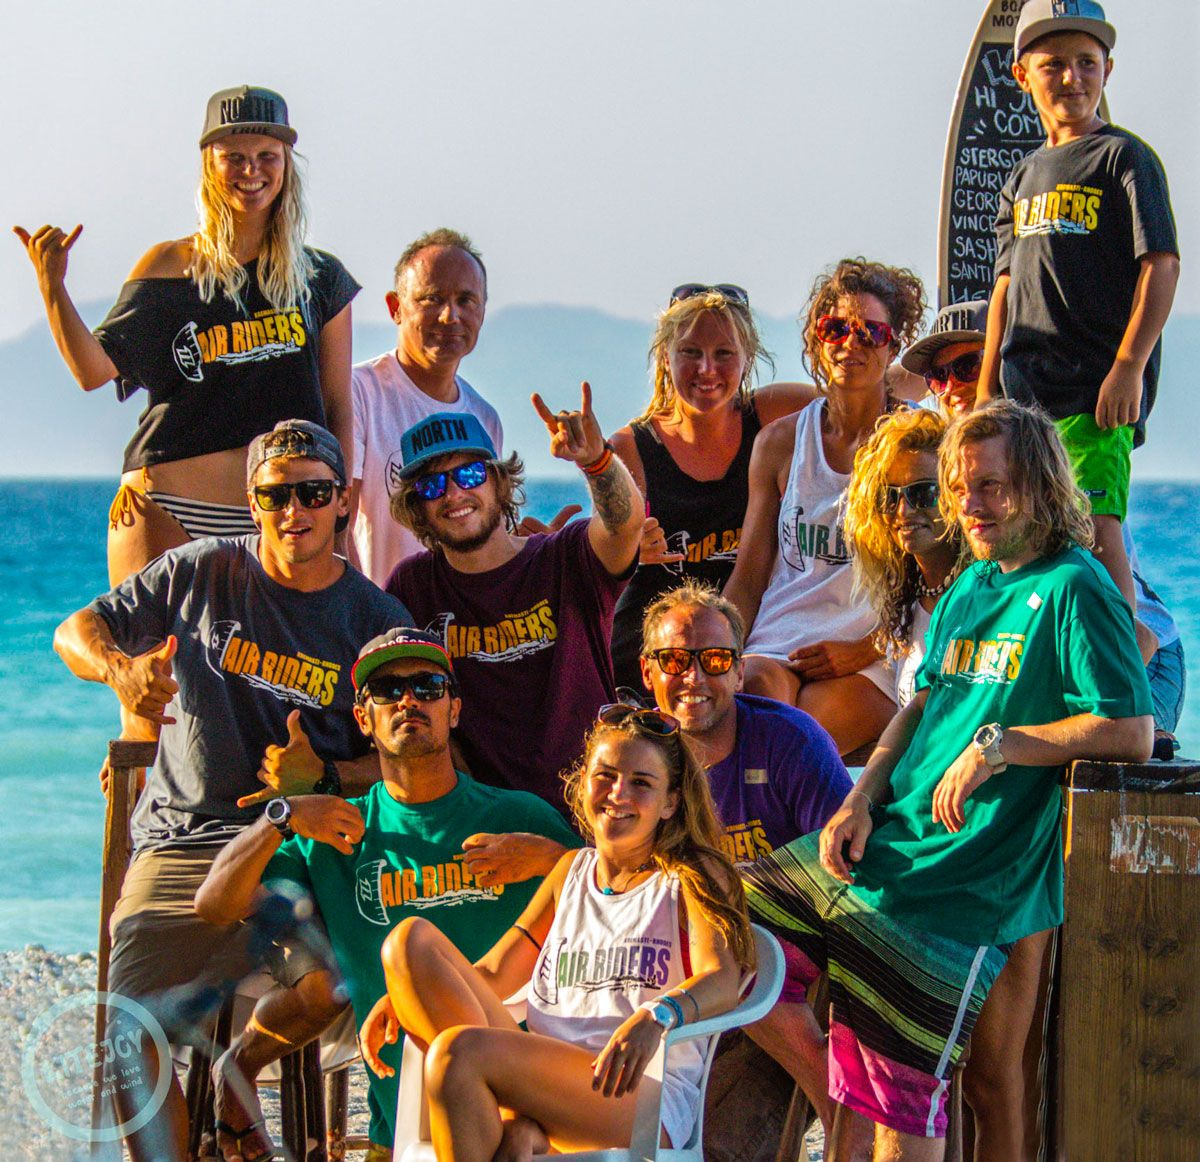 team-kitesurfing-kite-air-riders-kitepro-center-kremasti-rhodes-family